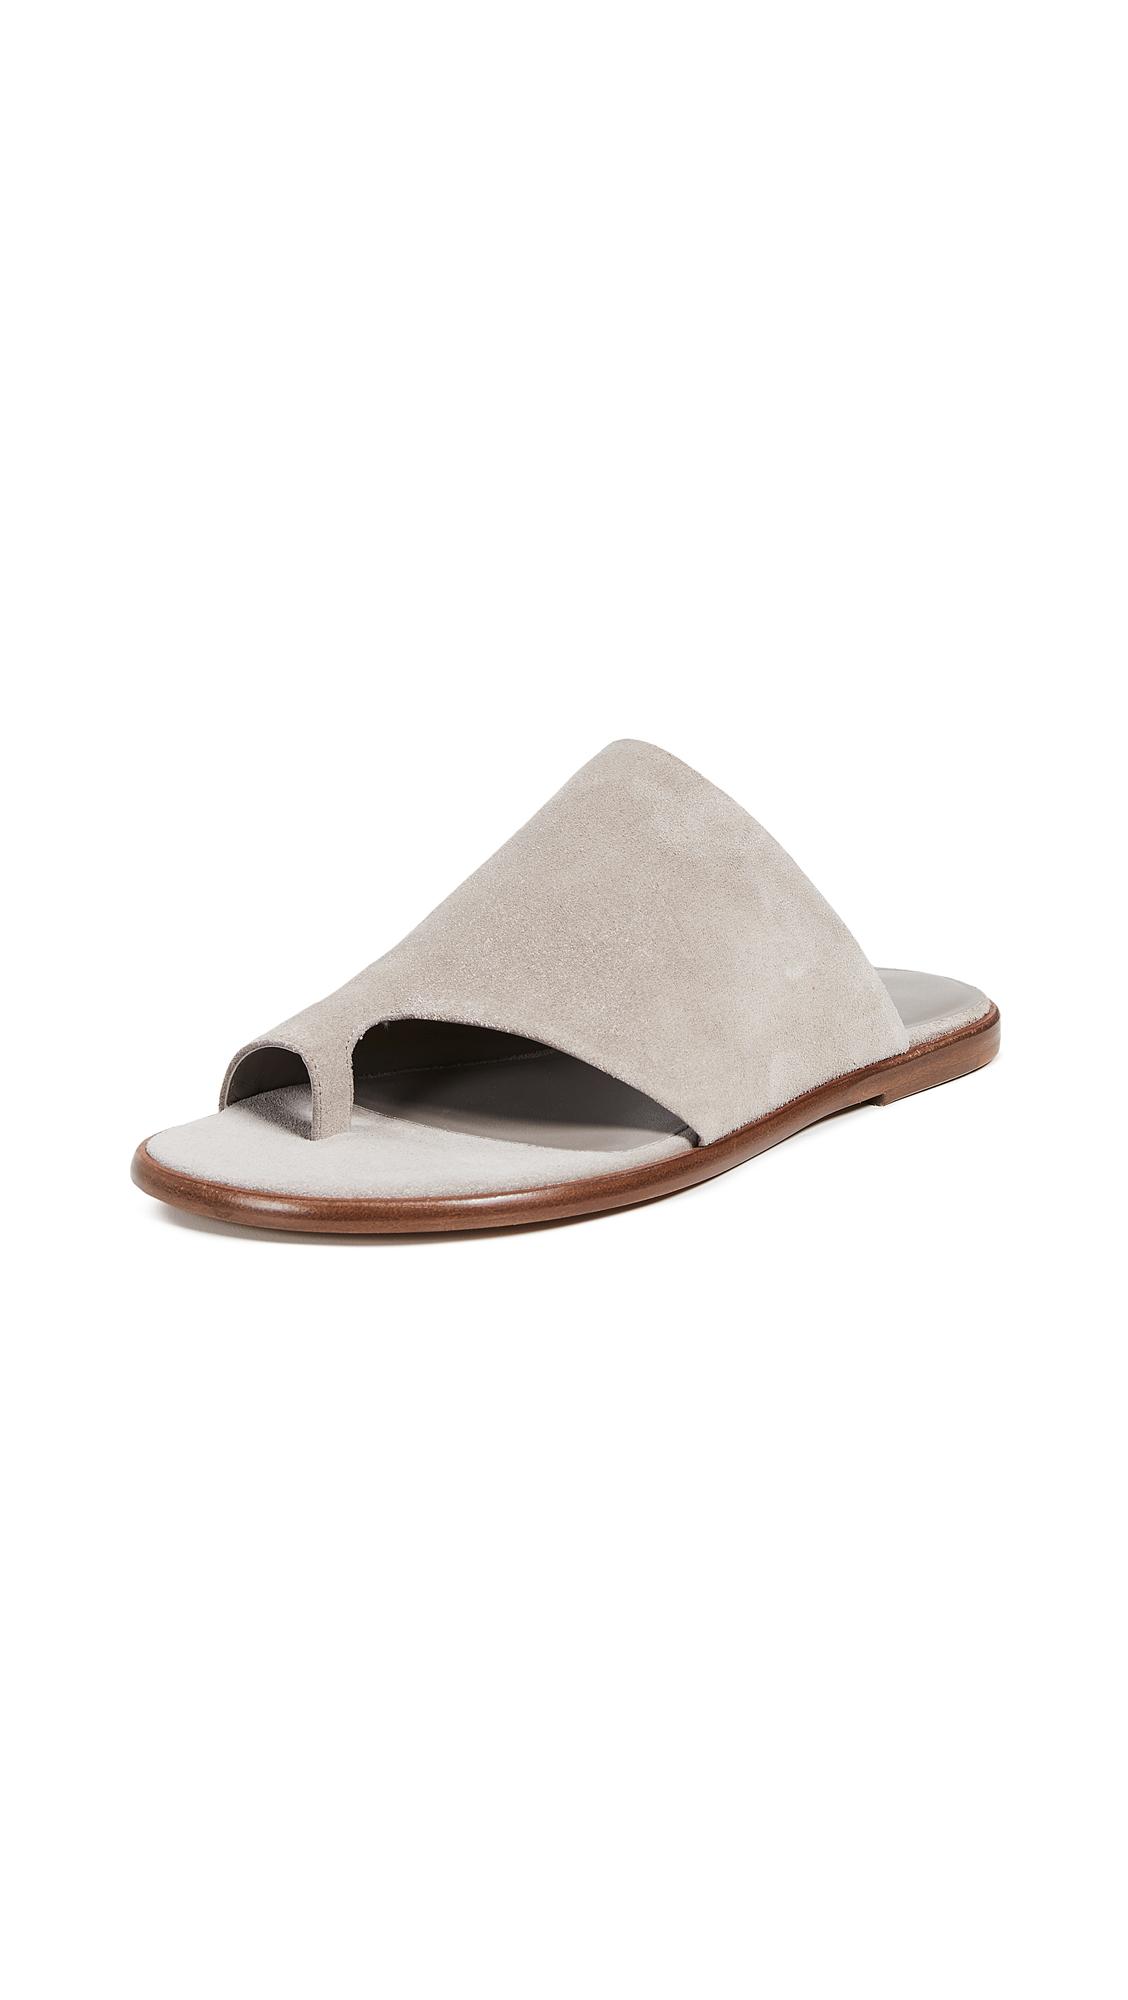 Vince Edris Toe Ring Slide Sandals - Lt Woodsmoke